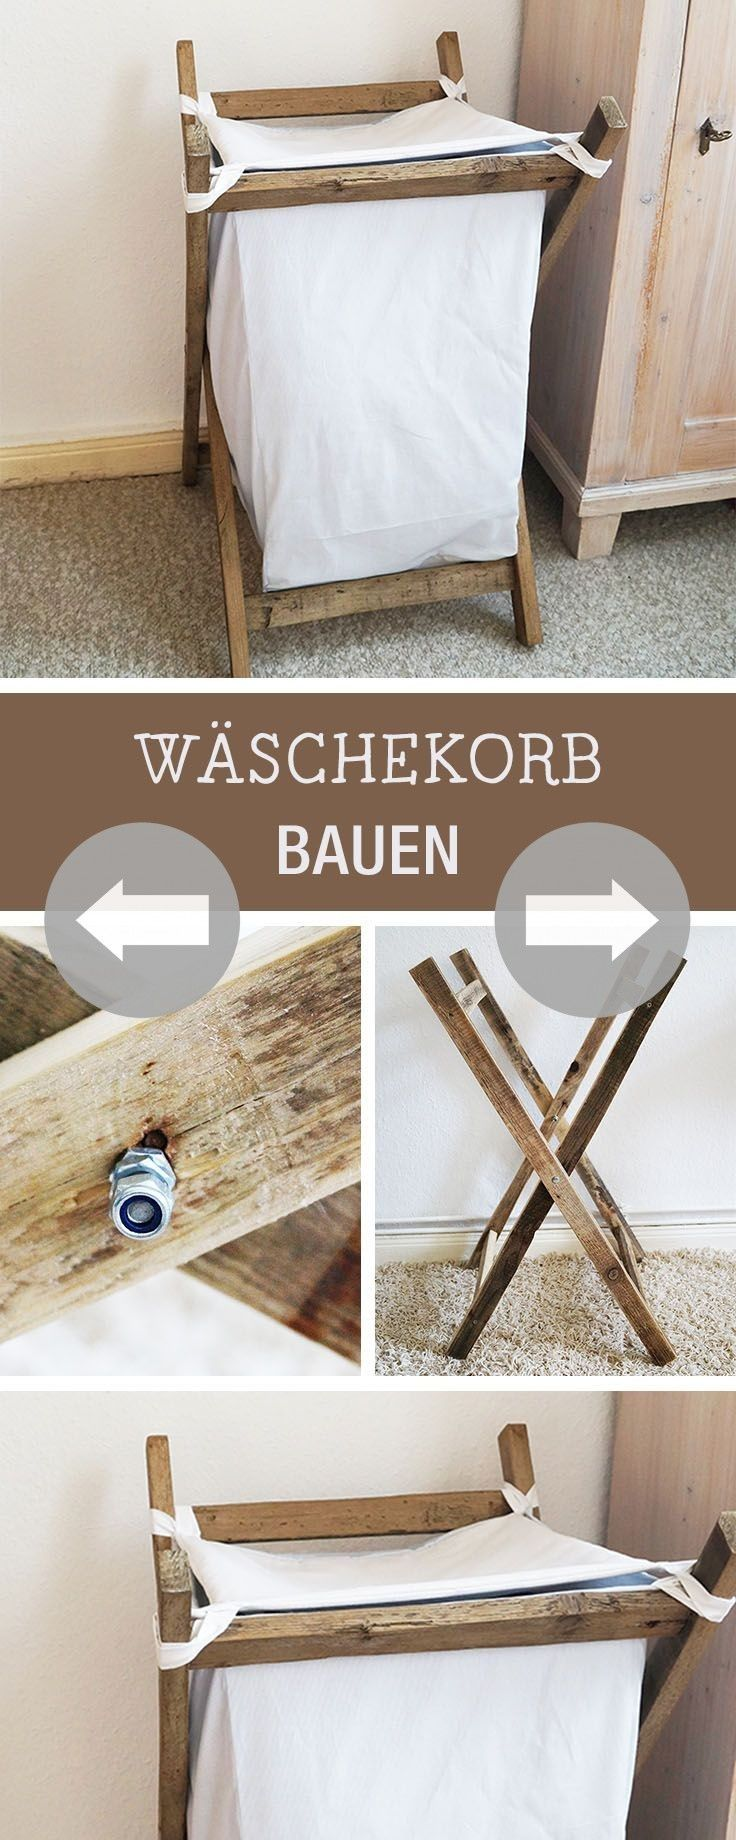 Wohnkultur design bilder diy instructions homemade laundry basket rustic home decor  diy